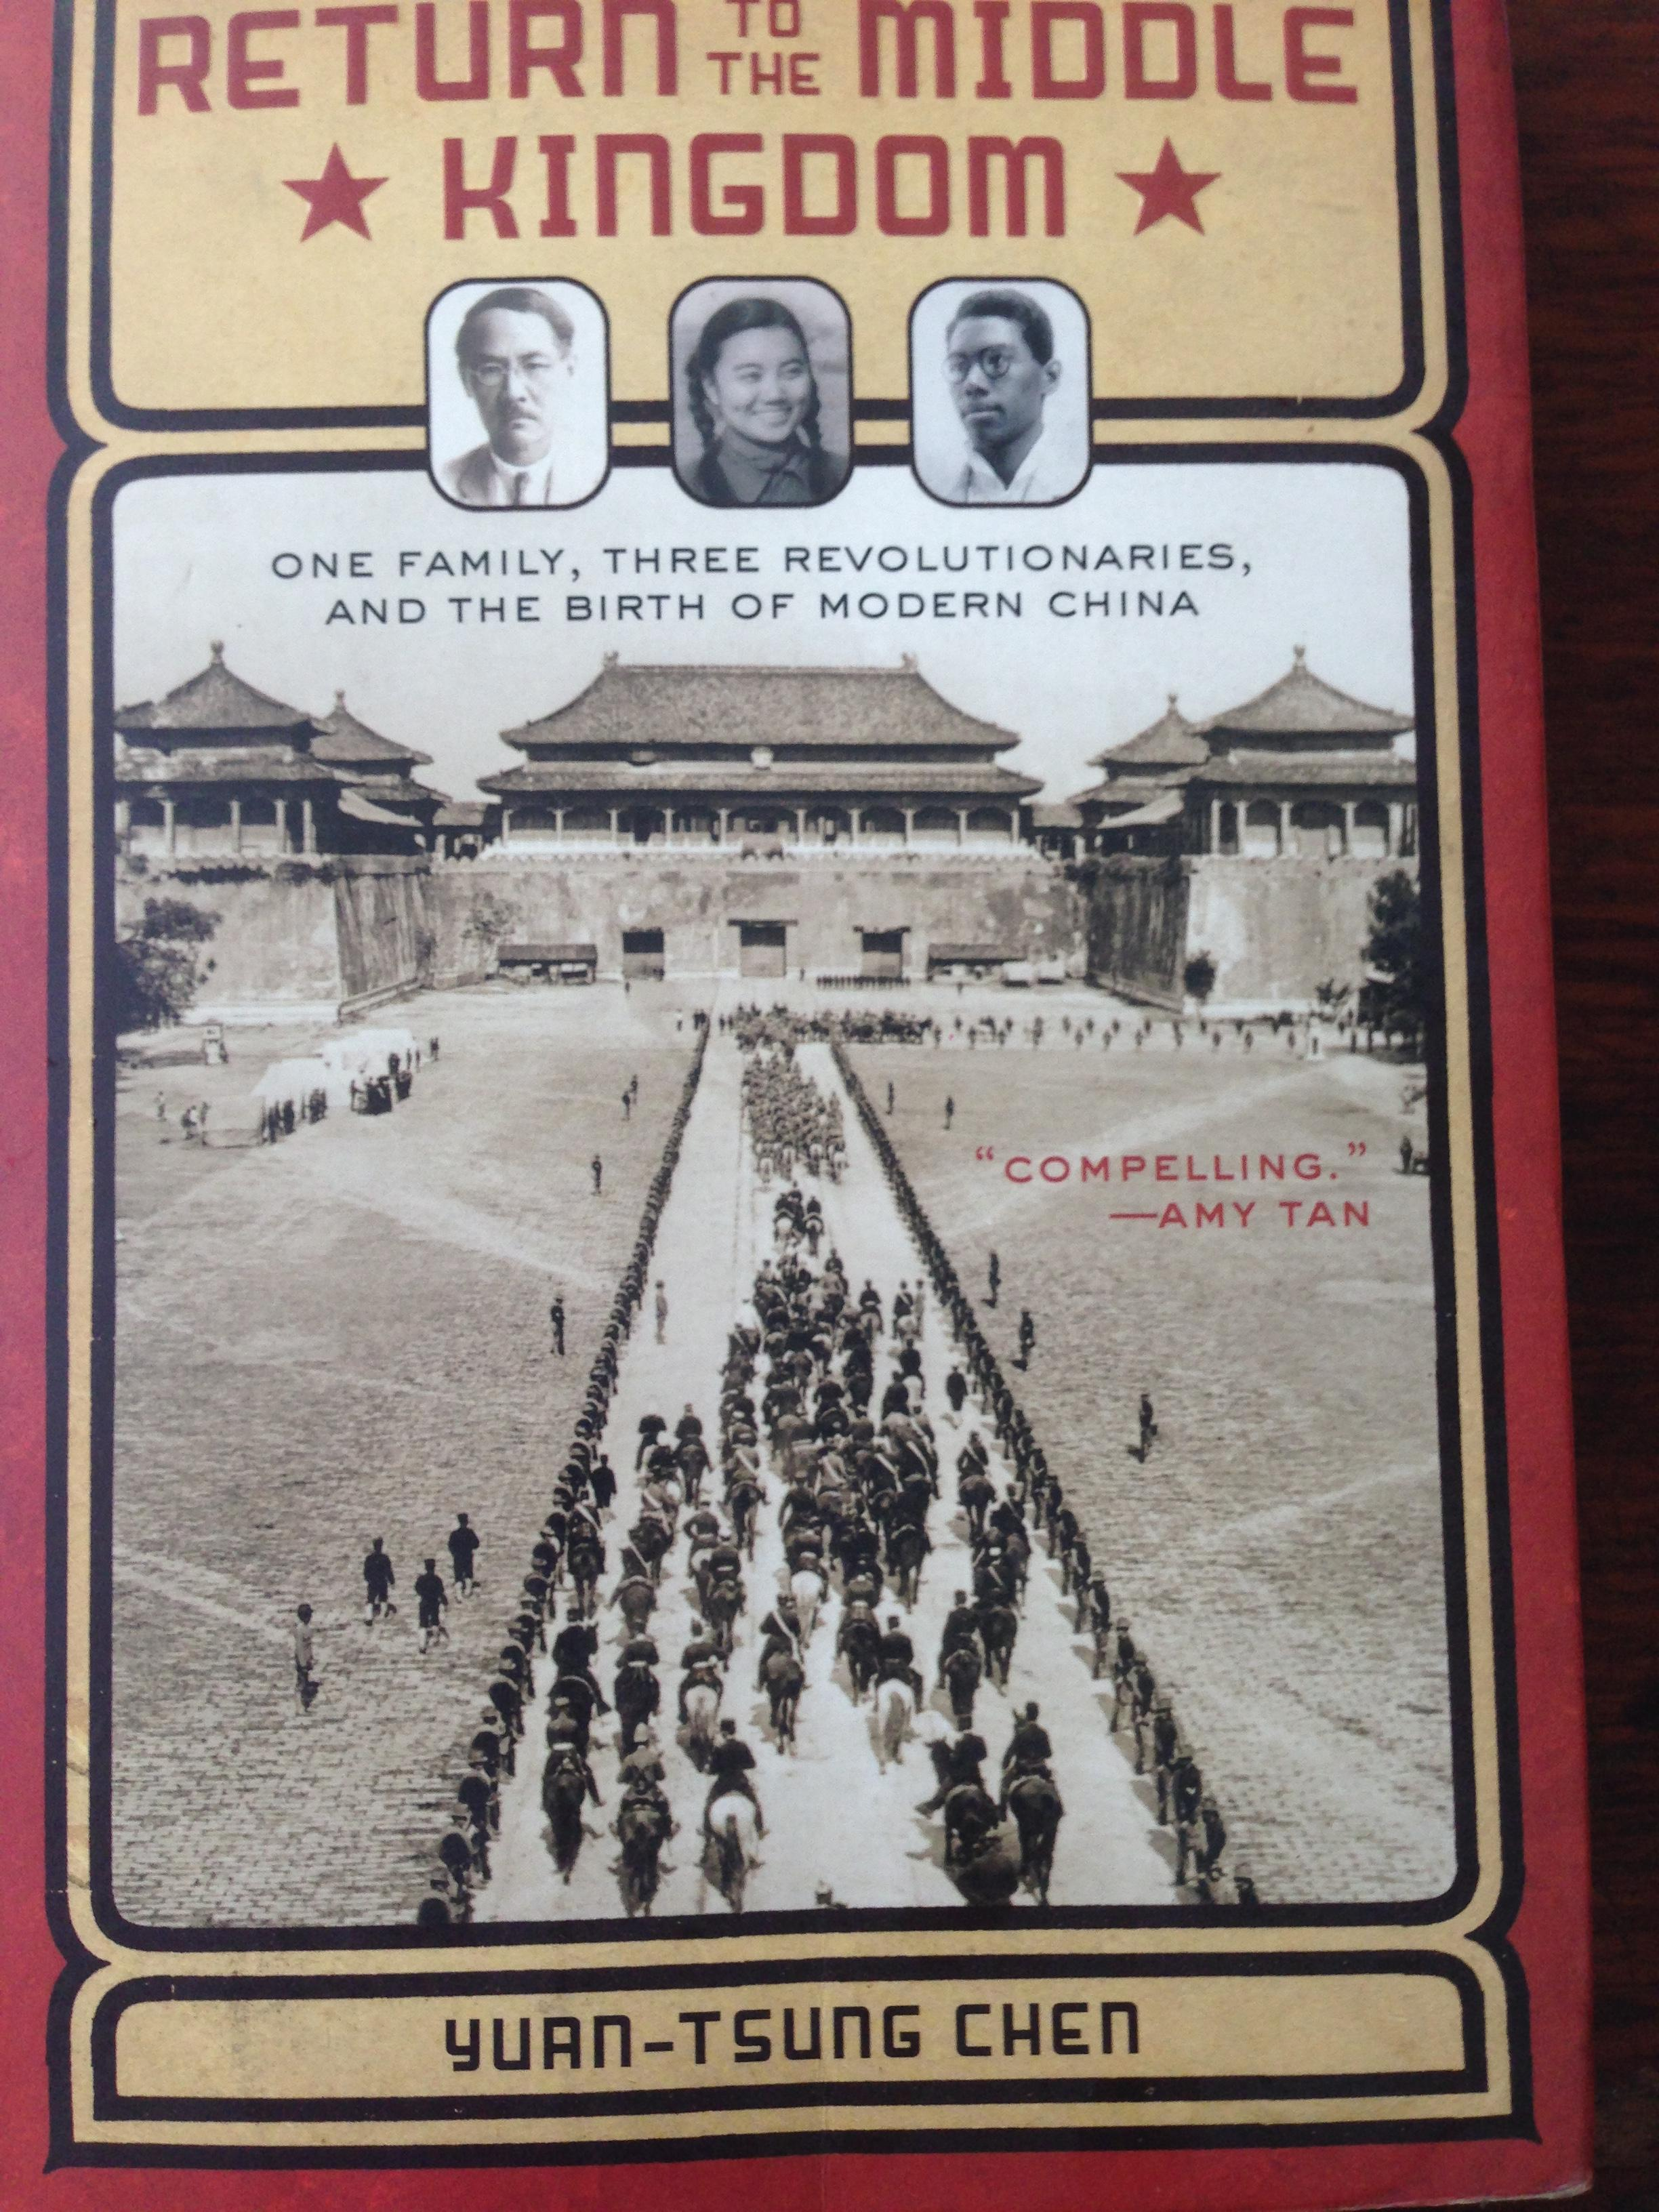 RETURN to the MIDDLE KINGDOM. one family. Three Revolutionaries and the Birth of modern China. หนังสือหนา402หน้า ราคา525บาท ลดเหลือ 450บาท(รวมค่าส่ง)